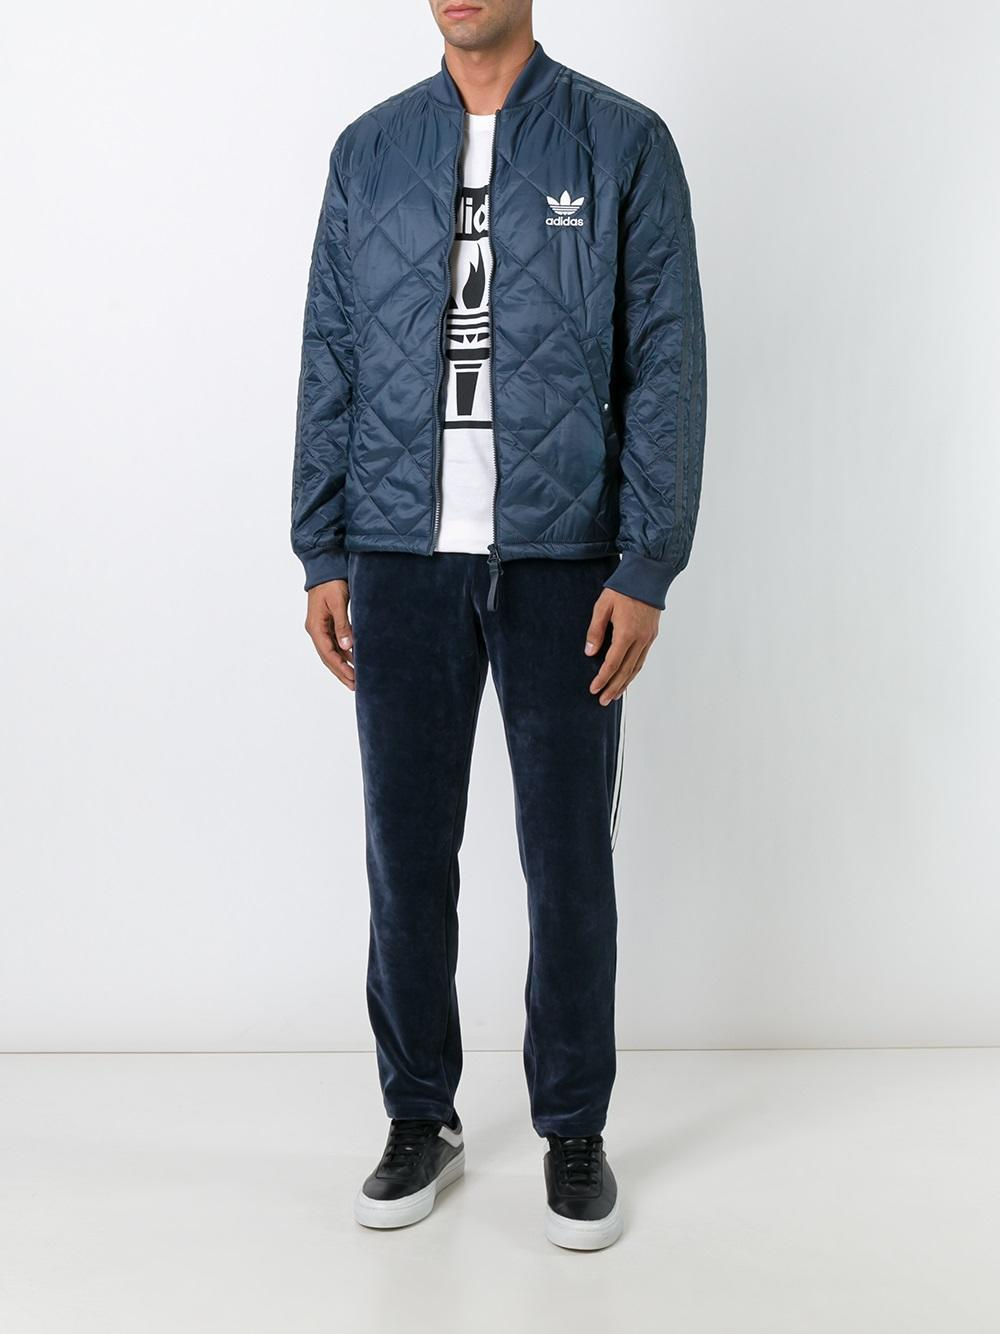 Lyst Adidas Originals Quilted Superstar Bomber Jacket